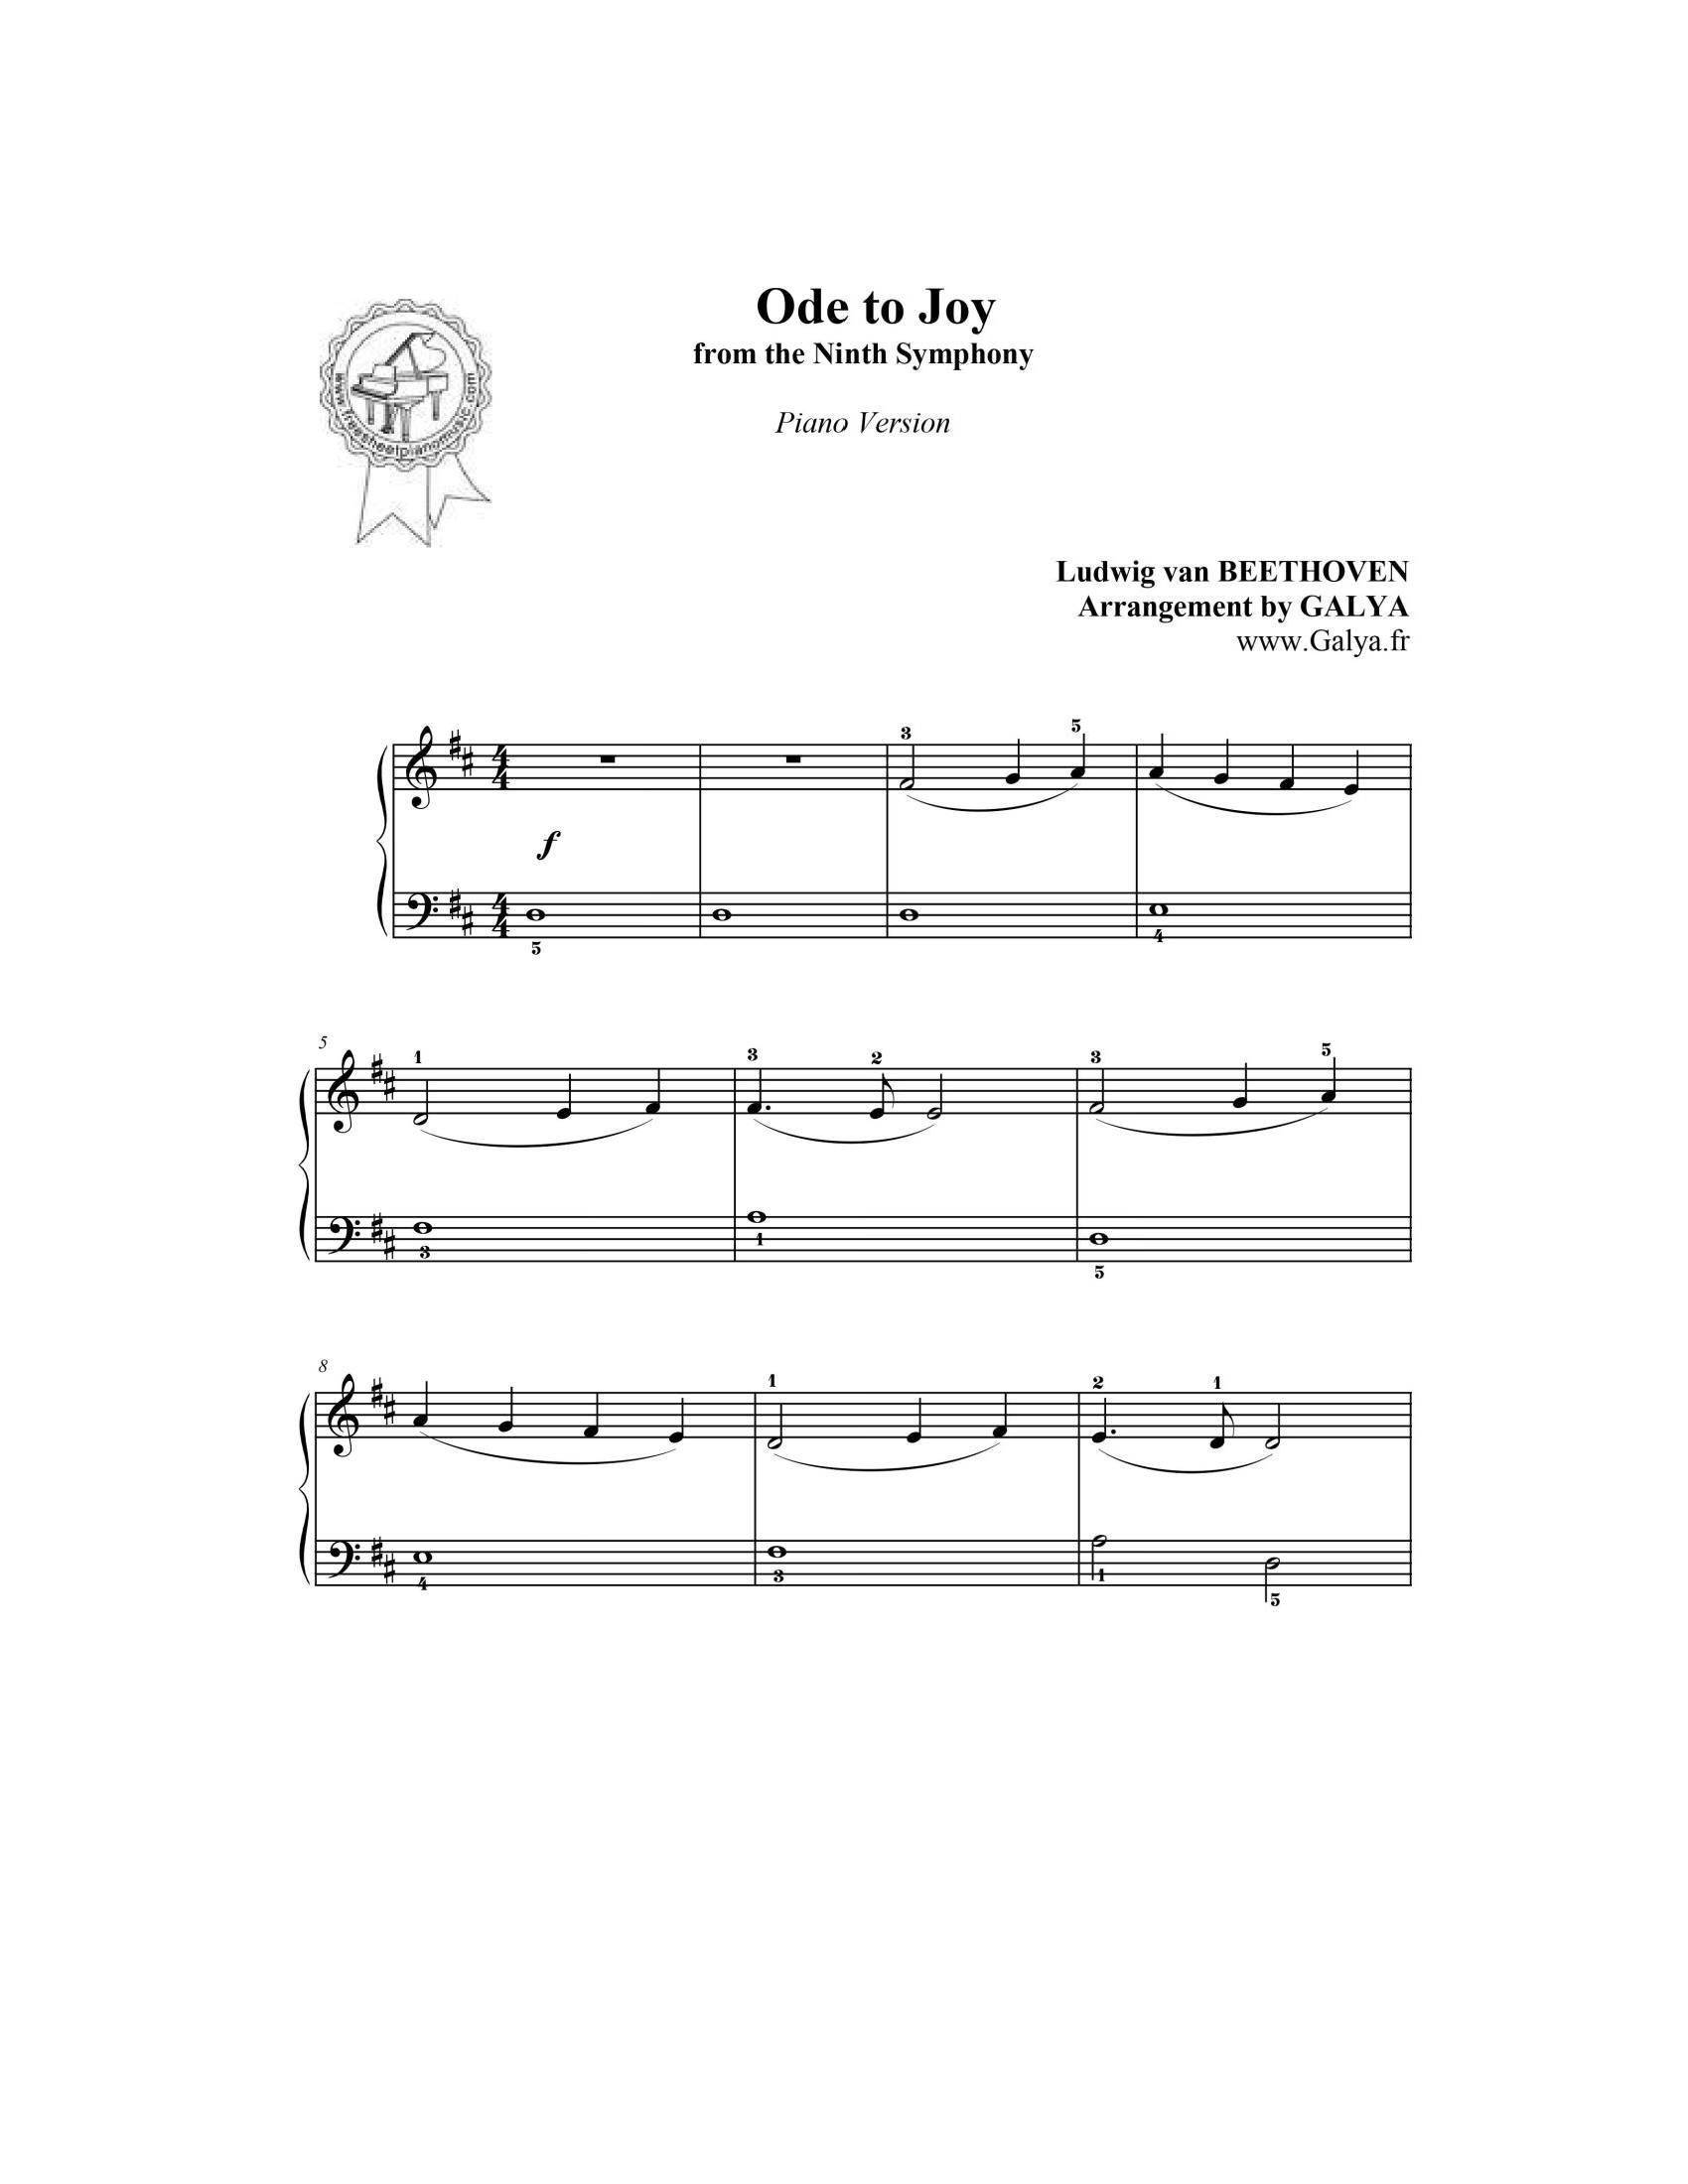 Beethoven Ode to joy1 - نت آهنگ Ode to joy از Beethoven